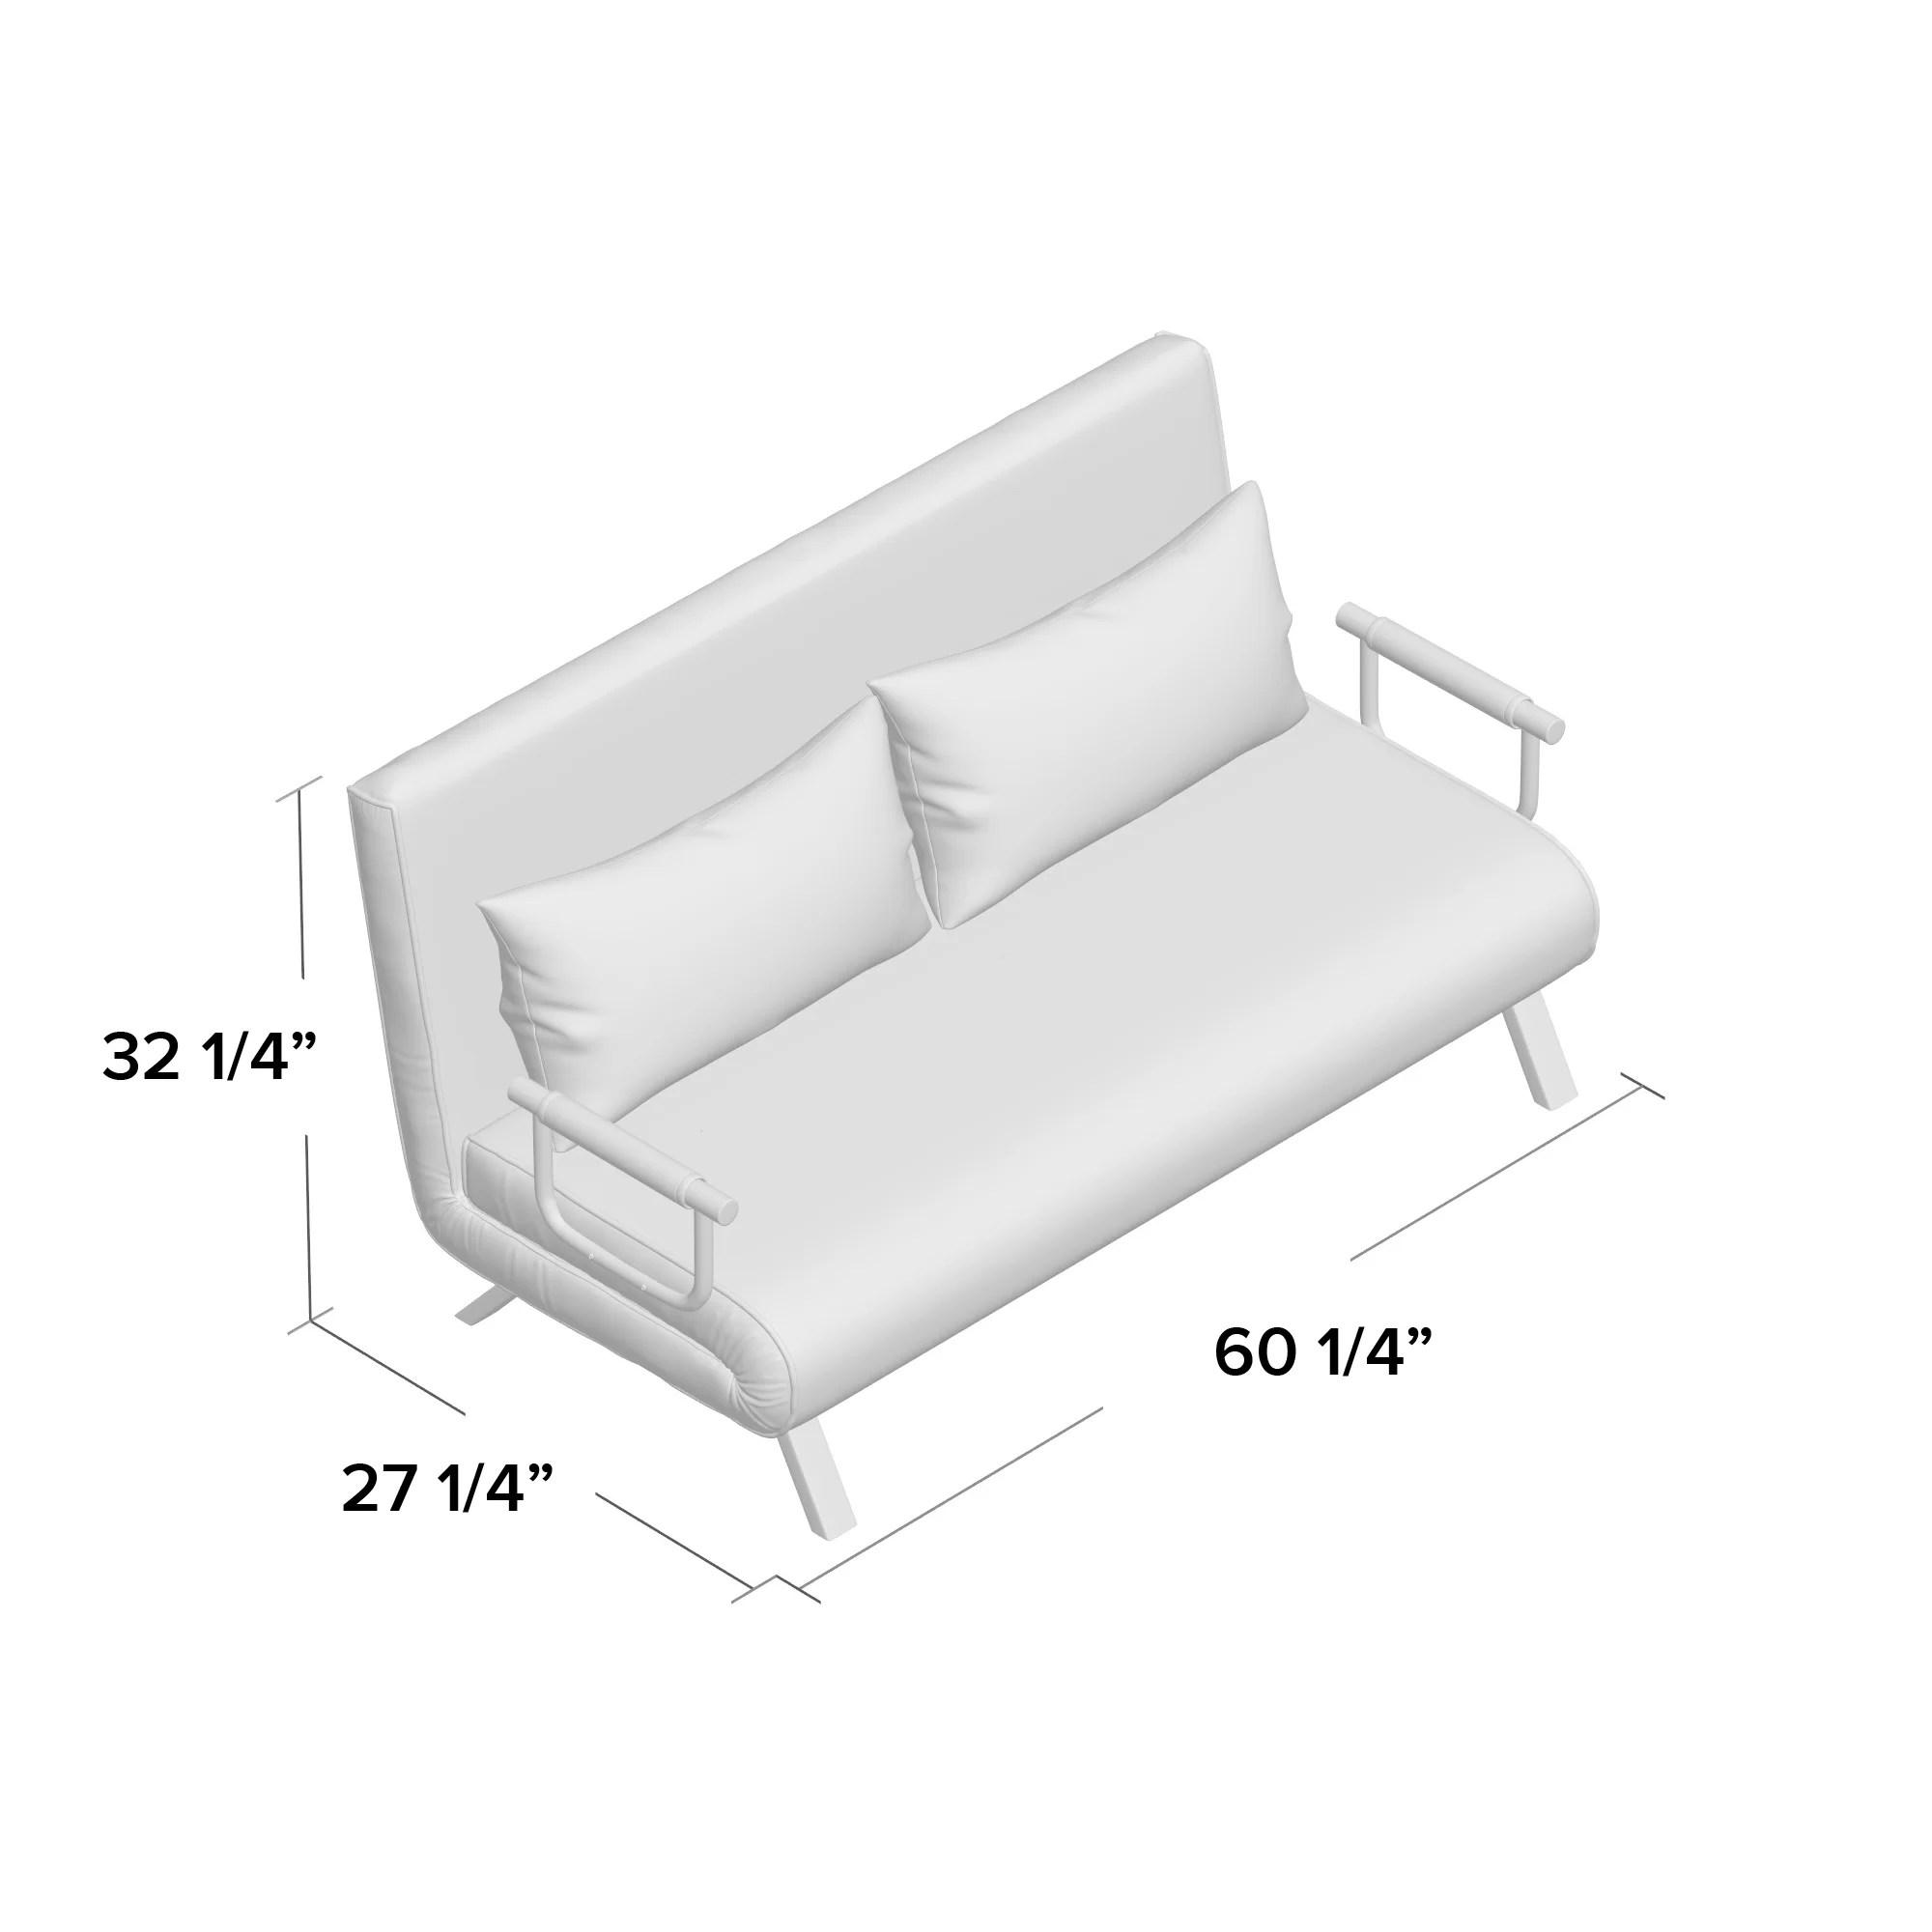 Ebern Designs Westbury Park Sofa Bed 60 25 Inches Loveseat Reviews Wayfair